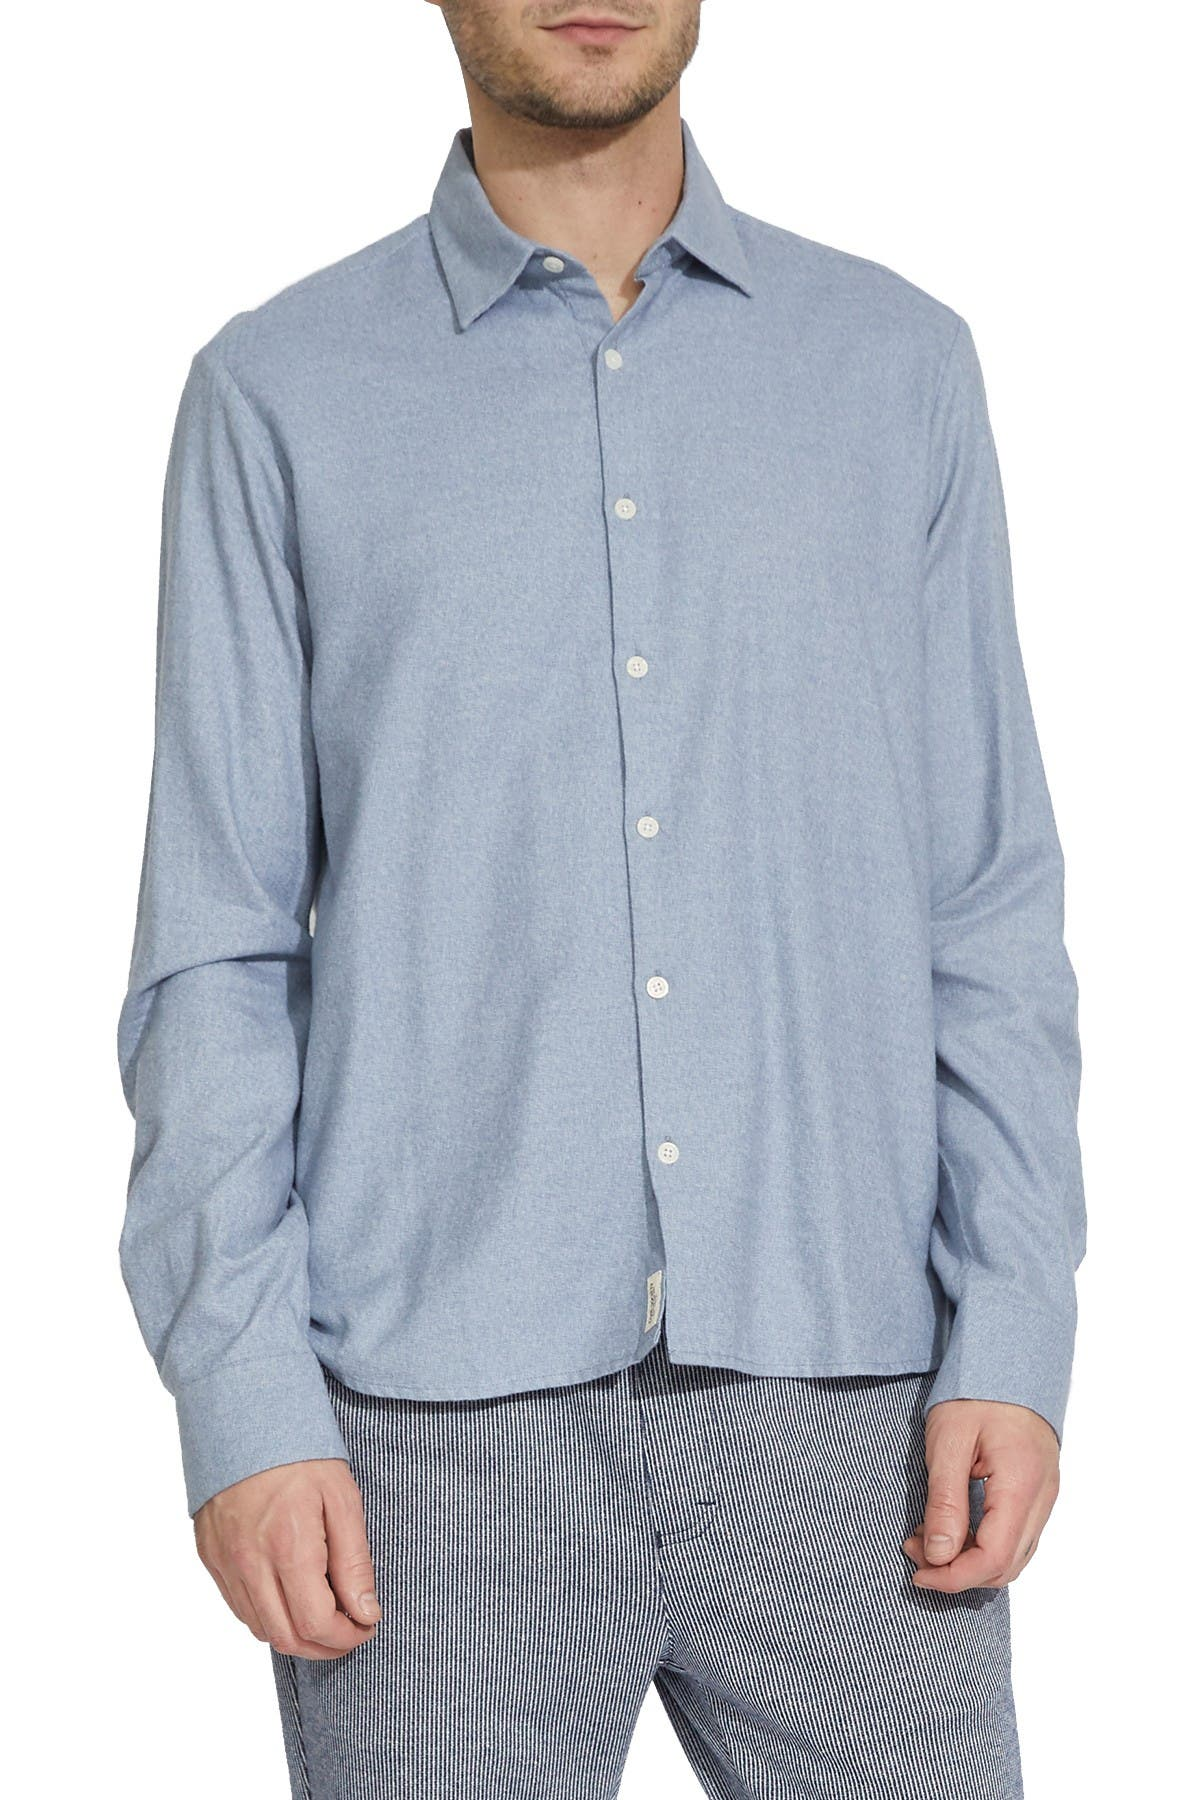 Image of Civil Society Howe Brushed Flannel Regular Fit Shirt